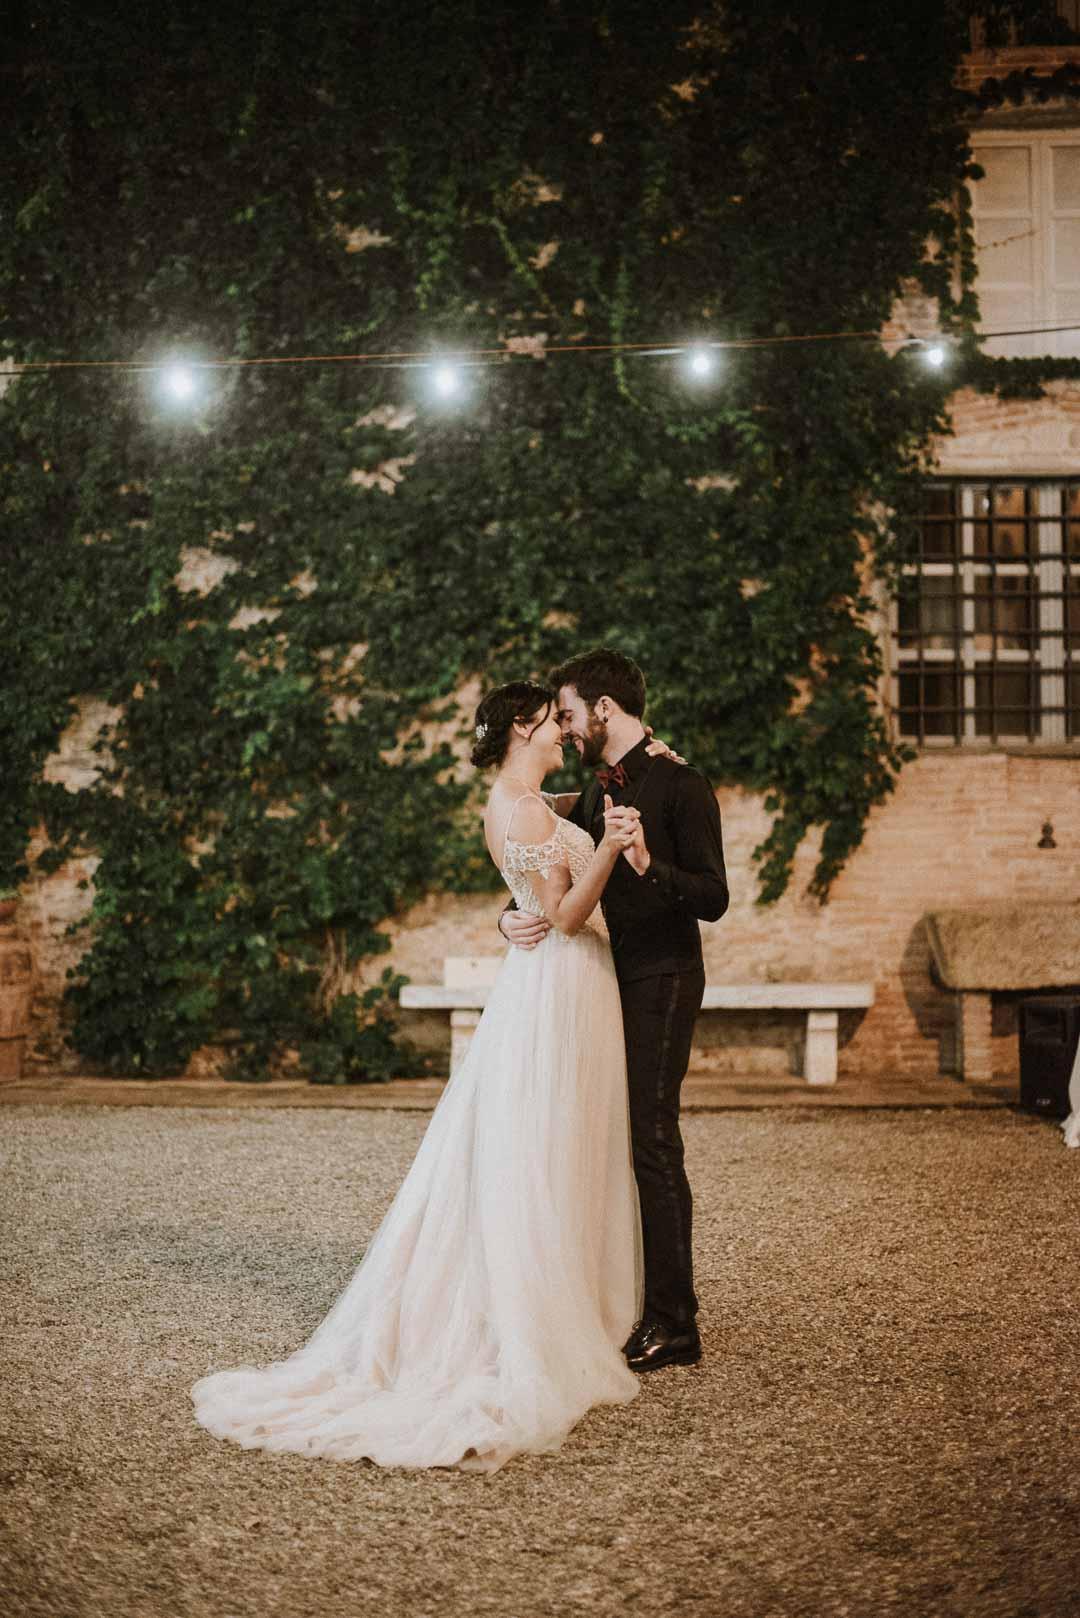 wedding-photographer-destination-fineart-bespoke-reportage-tuscany-villascorzi-vivianeizzo-spazio46-177